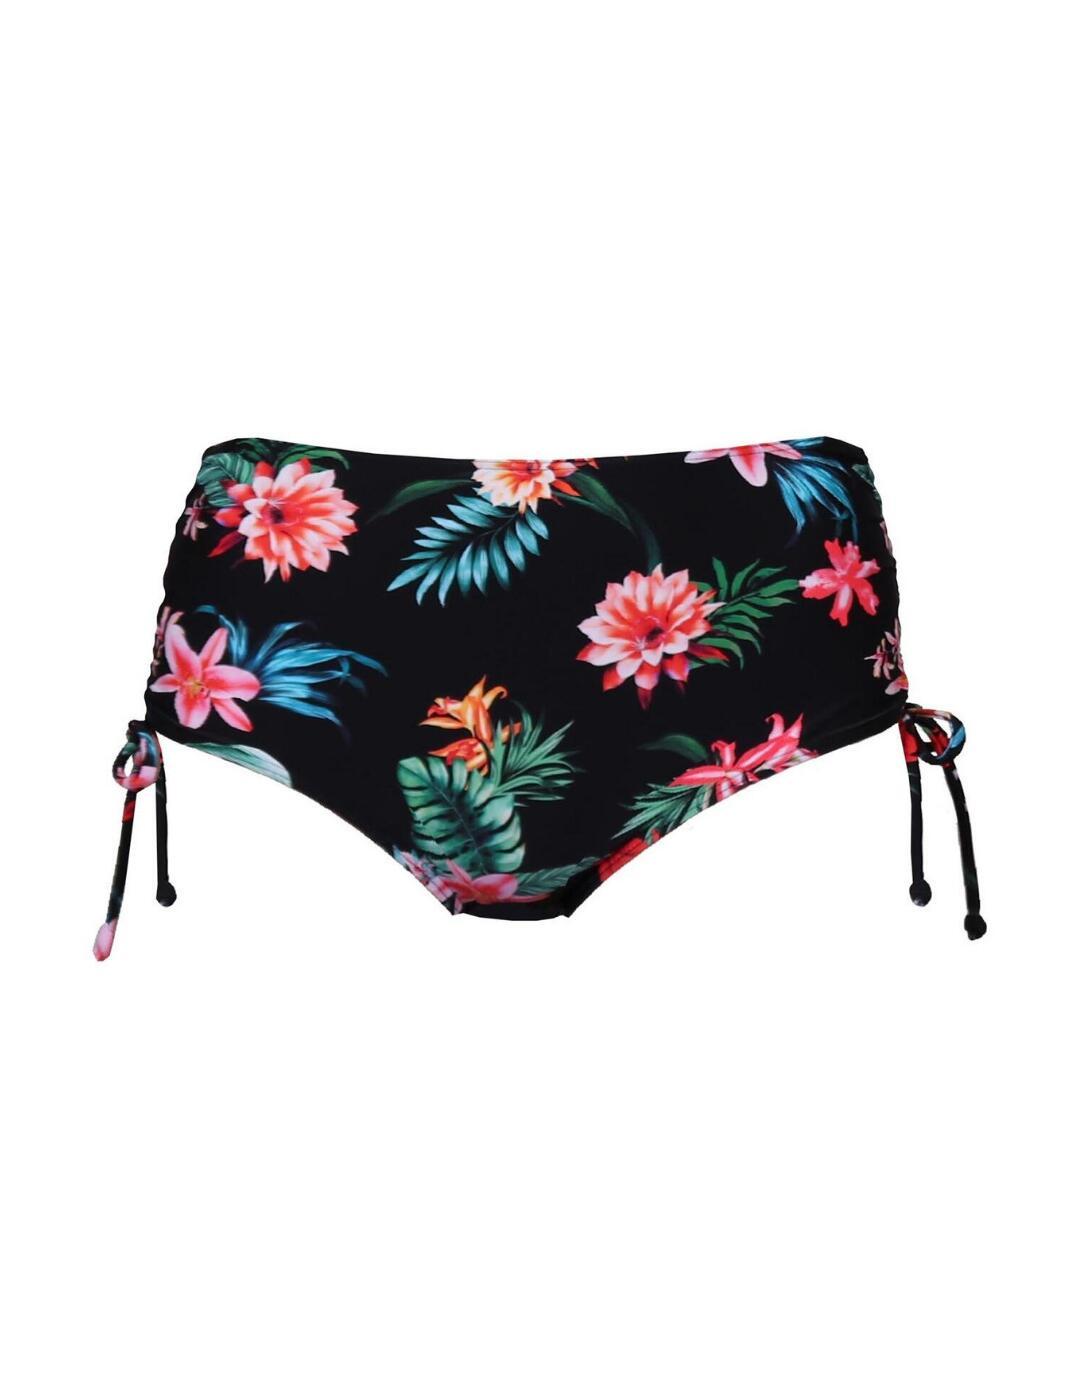 Pour Moi Waterfall Adjustable Bikini Brief Tropical